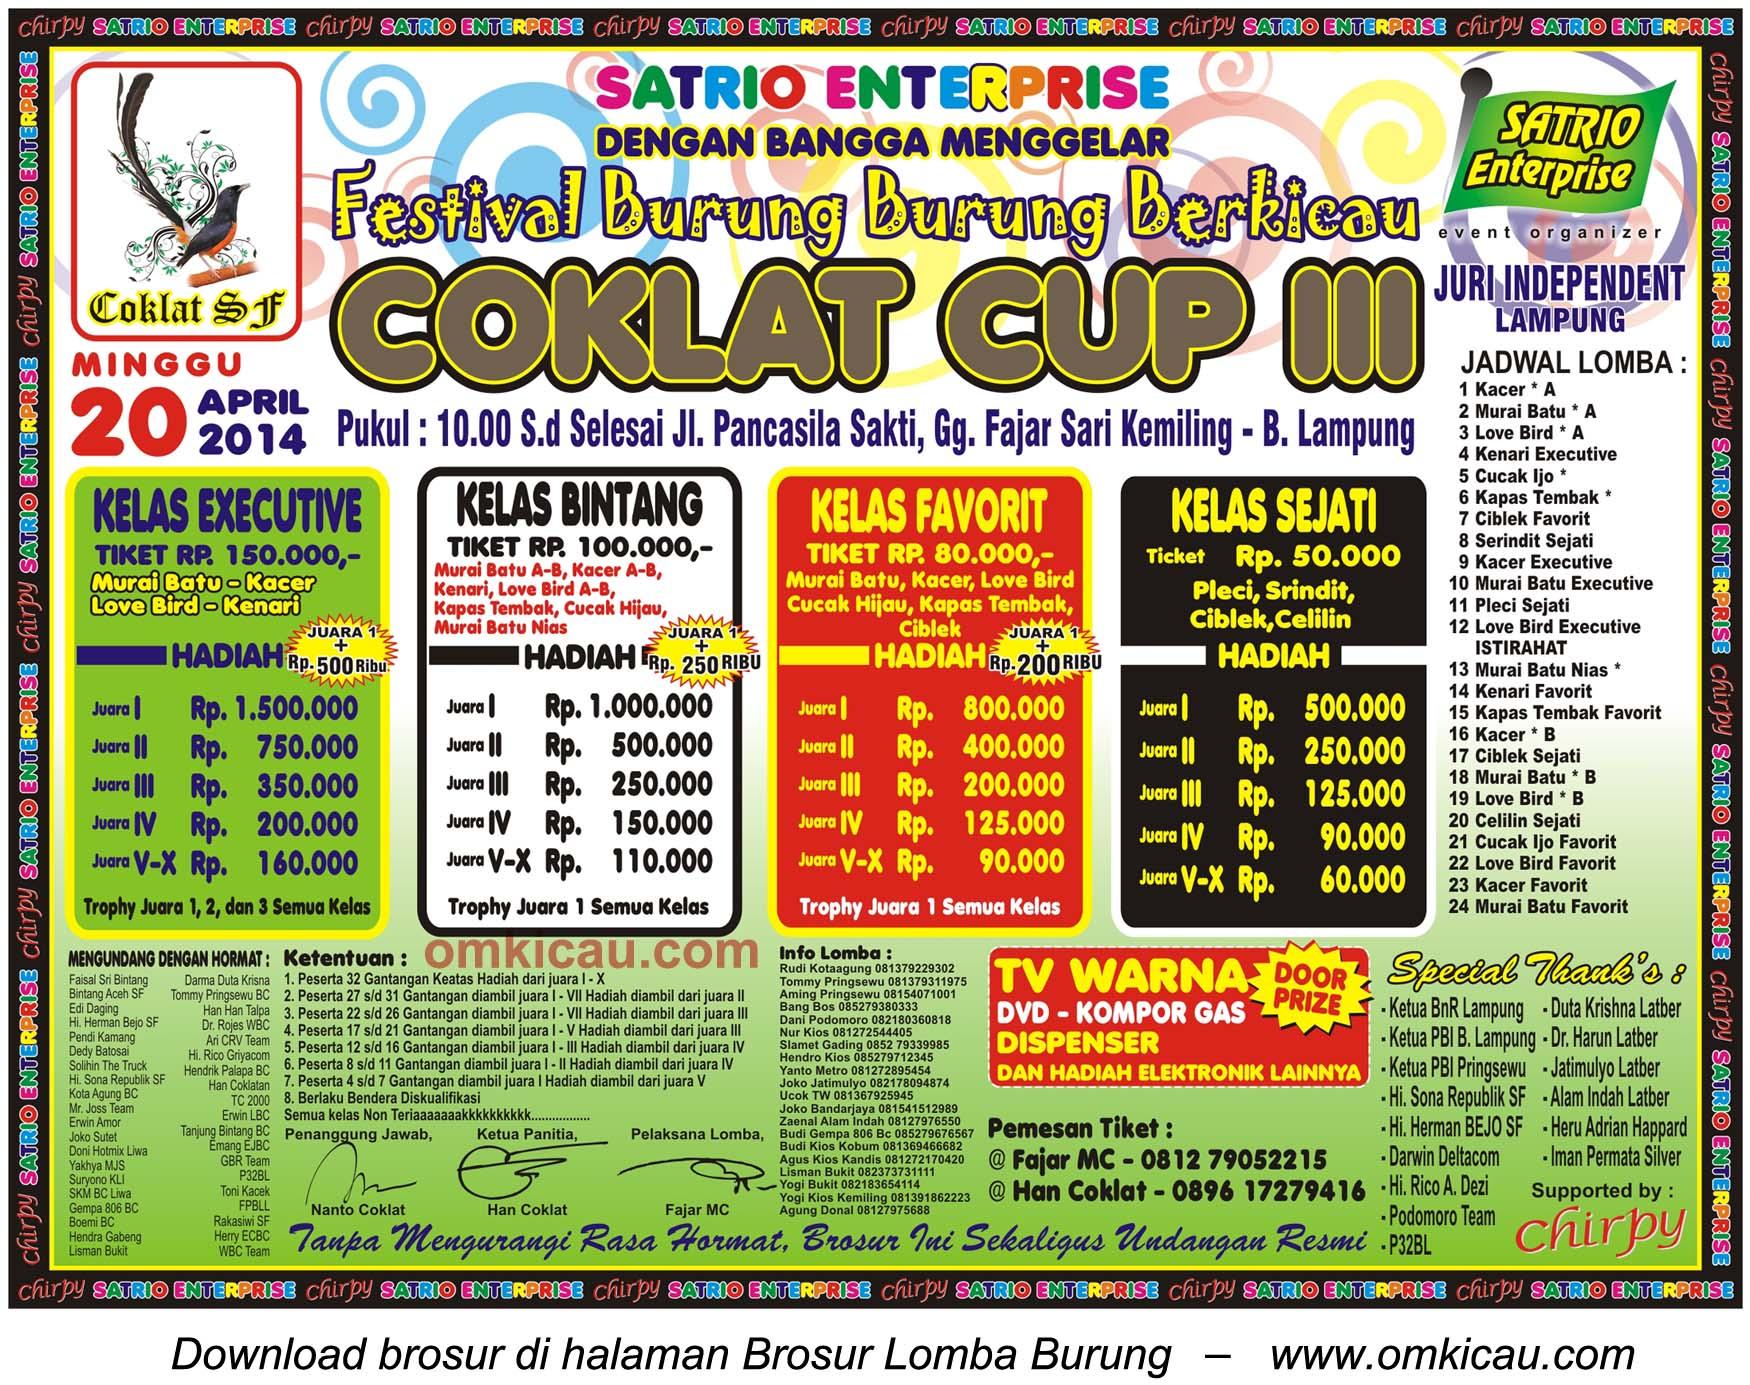 Brosur Lomba Burung Berkicau Coklat Cup III, Bandarlampung, 20 April 2014